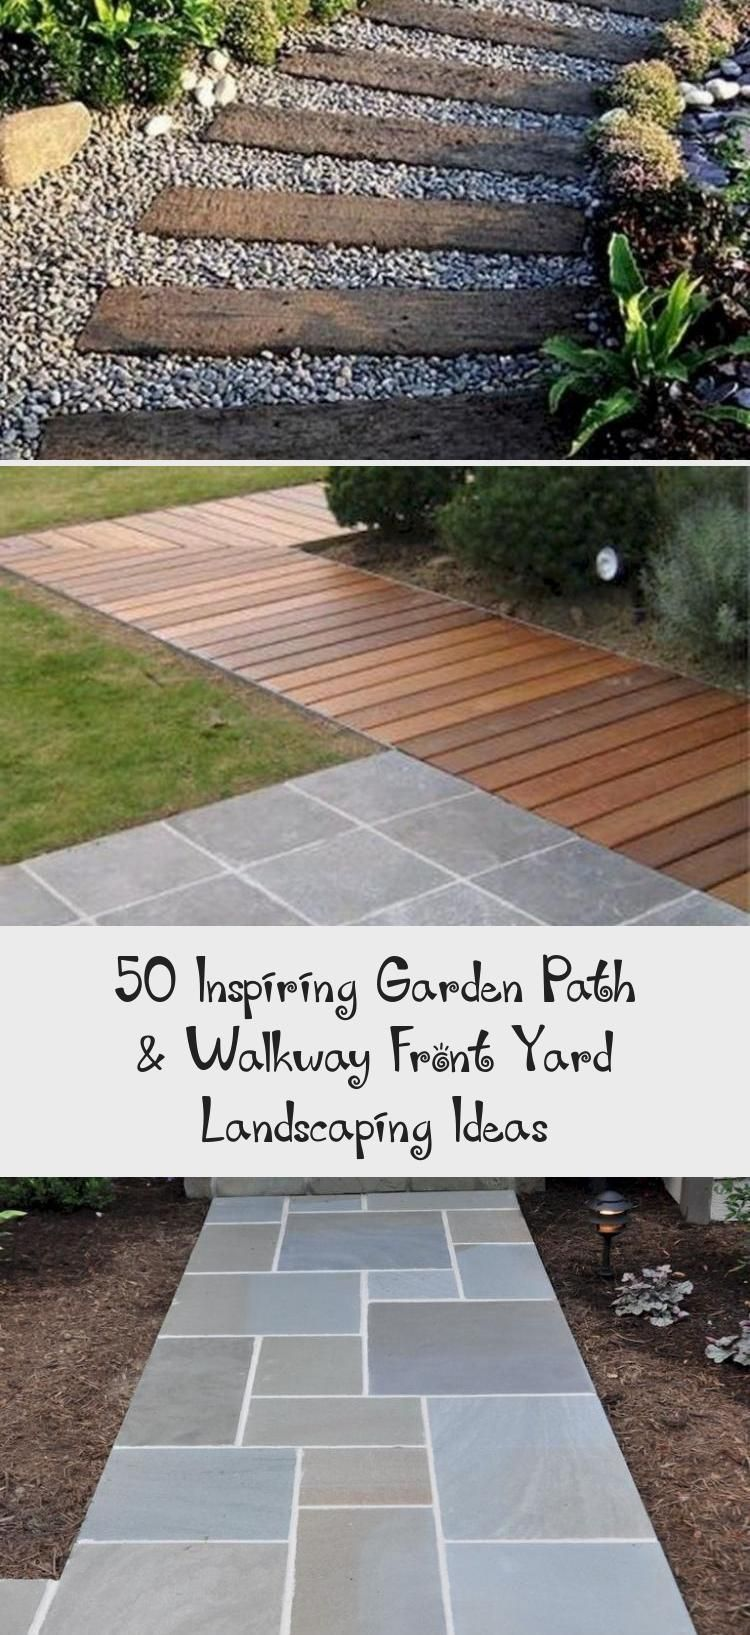 50 Inspiring Garden Path Walkway Front Yard Landscaping Ideas Architecture 50 Inspiring Garden Path W In 2020 Walkways Paths Small Yard Landscaping Garden Paths